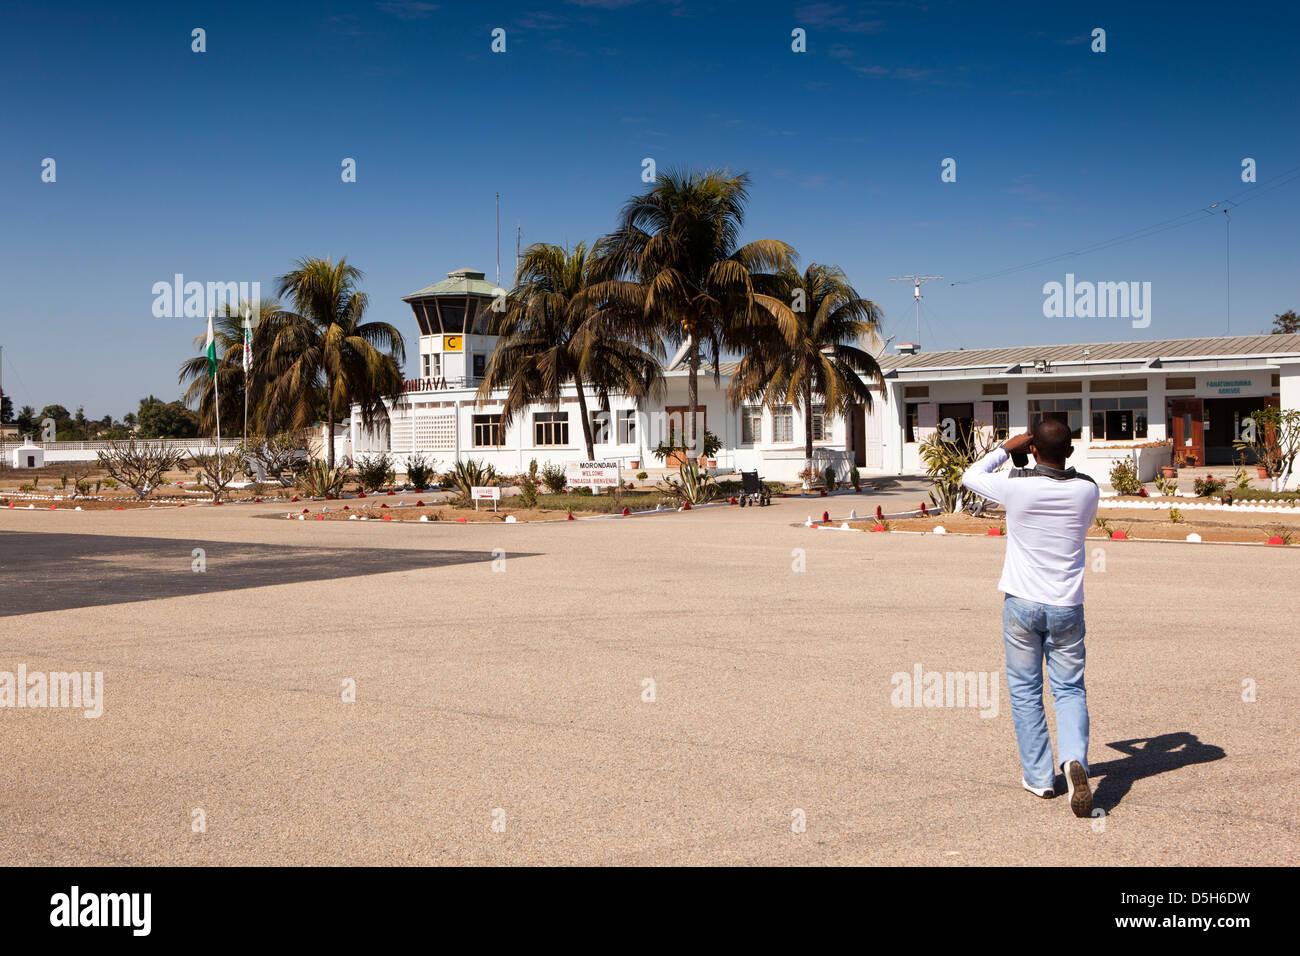 Madagascar, Morondava Airport, airside tourist photographing terminal building on tarmac apron - Stock Image